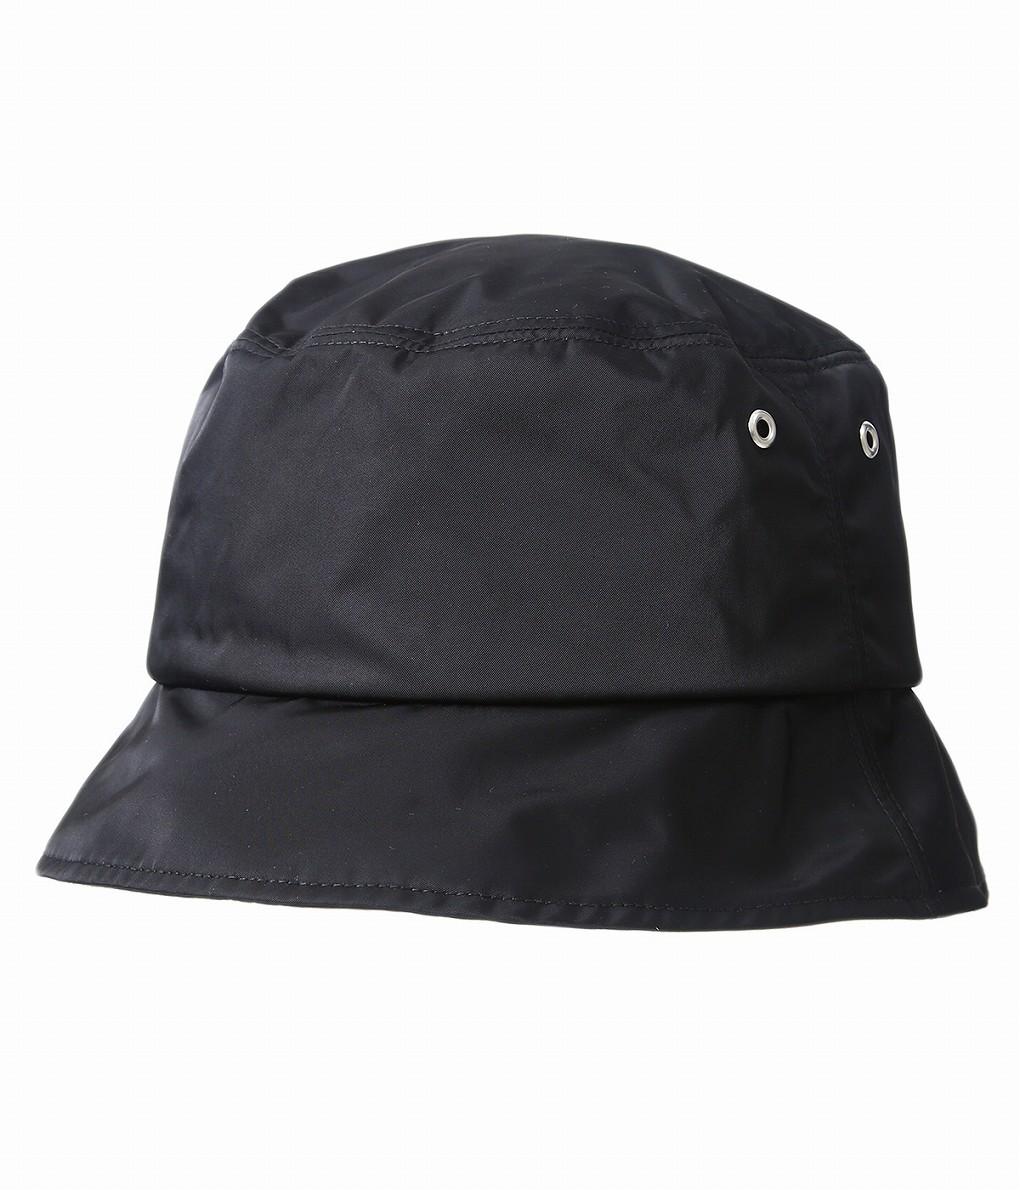 KIJIMA TAKAYUKI / キジマ タカユキ : Polyester Bucket Hat : ポリエステルバケットハット メンズ : 201002 【RIP】